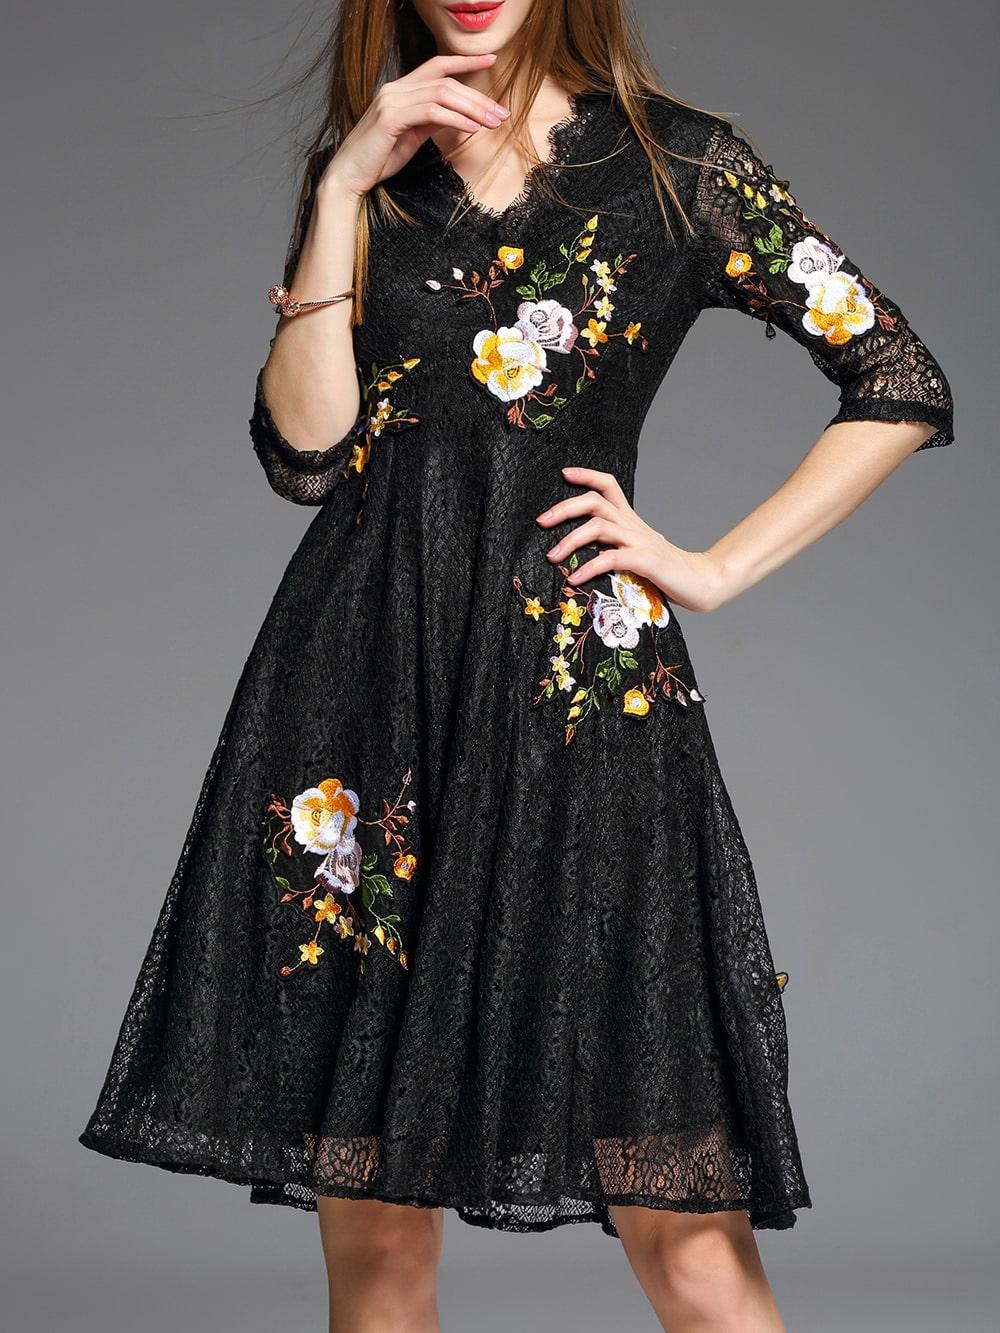 Black v neck flowers embroidered lace dress shein sheinside